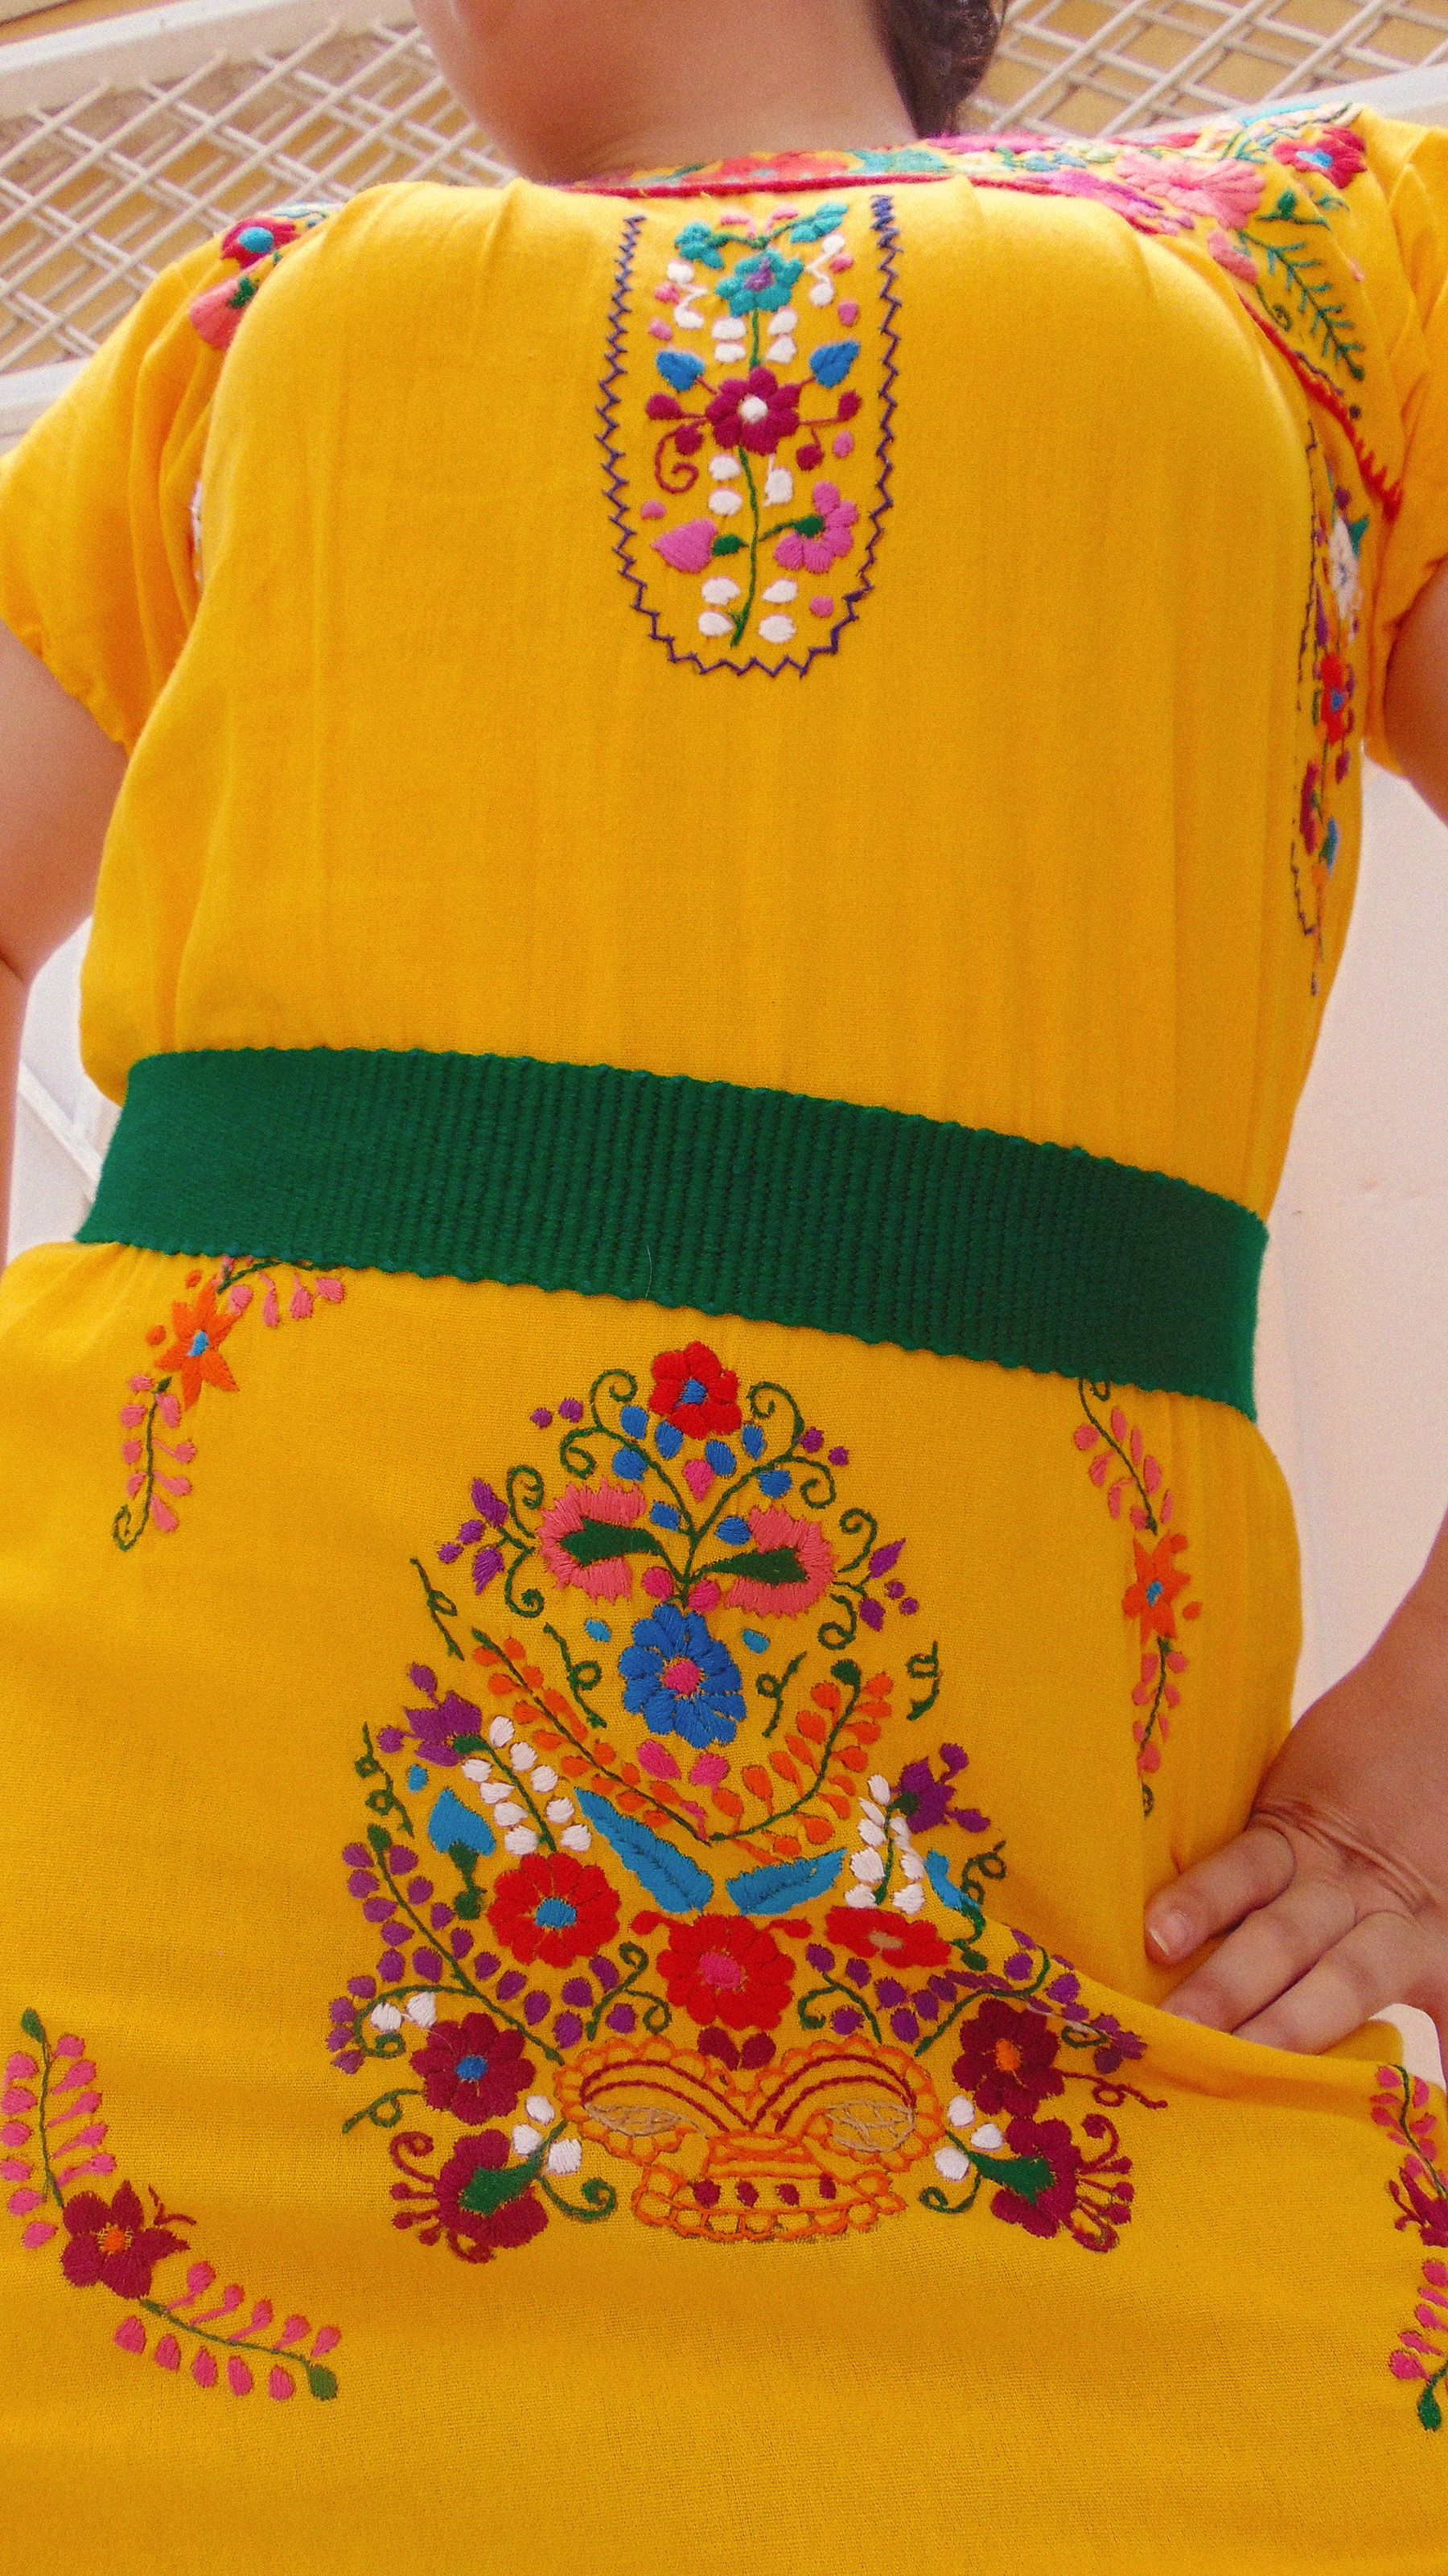 Mexican Dress Mini Puebla Dress Puebla Dress Mexican Puebla Dress Style Puebla Dress Embroidery Oax Mexican Dresses Mexican Embroidered Dress Puebla Dress [ 3202 x 1800 Pixel ]